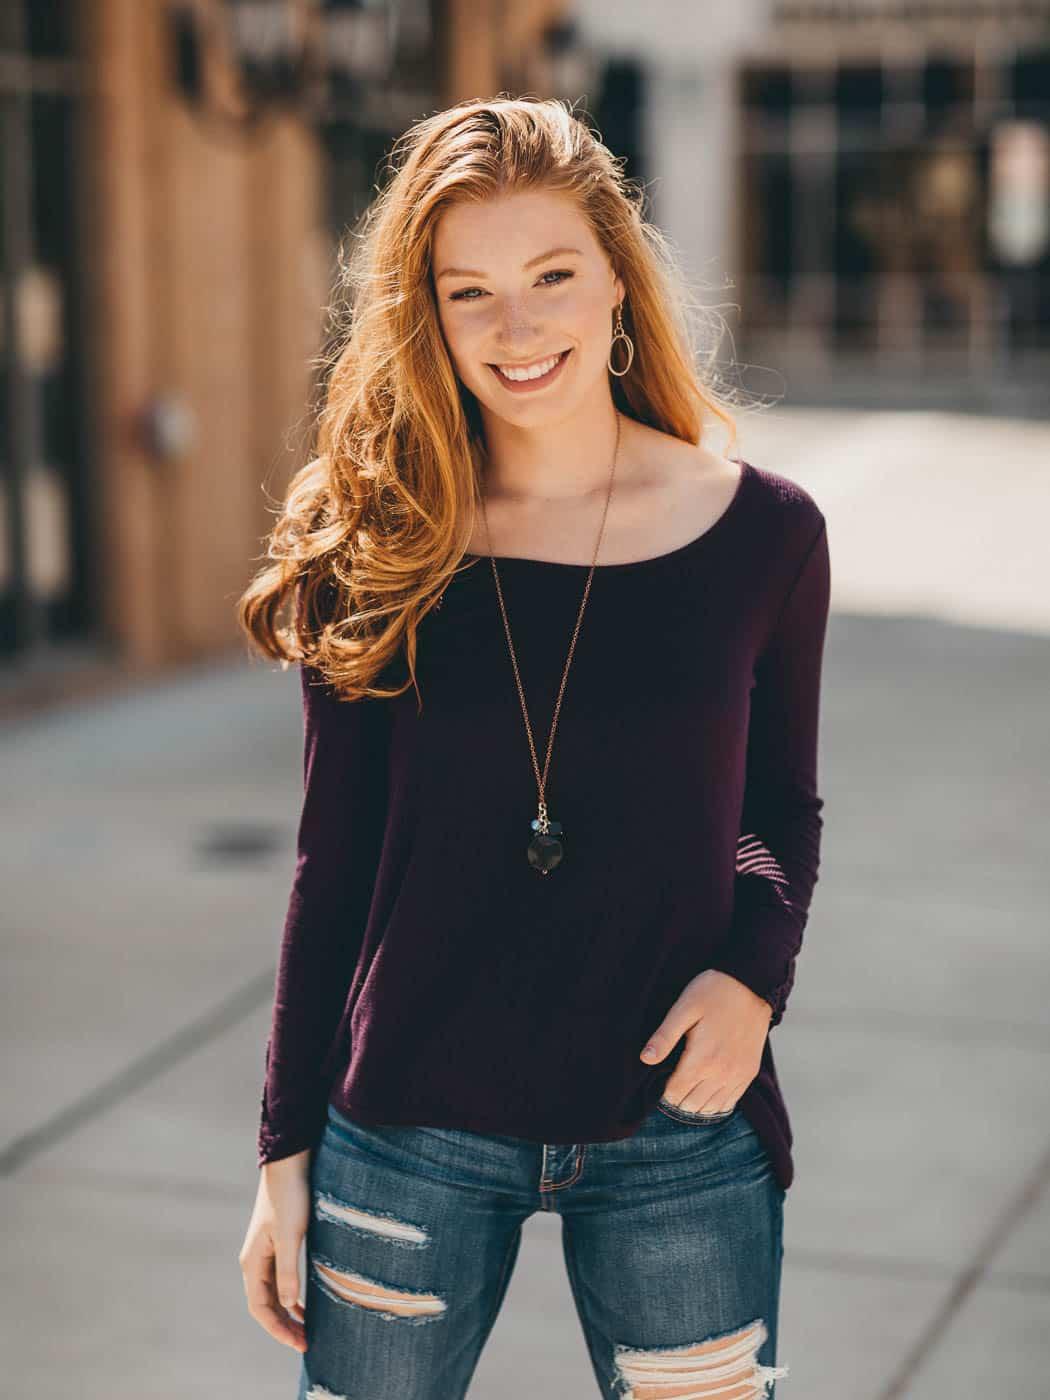 Fun editorial portrait of senior girl